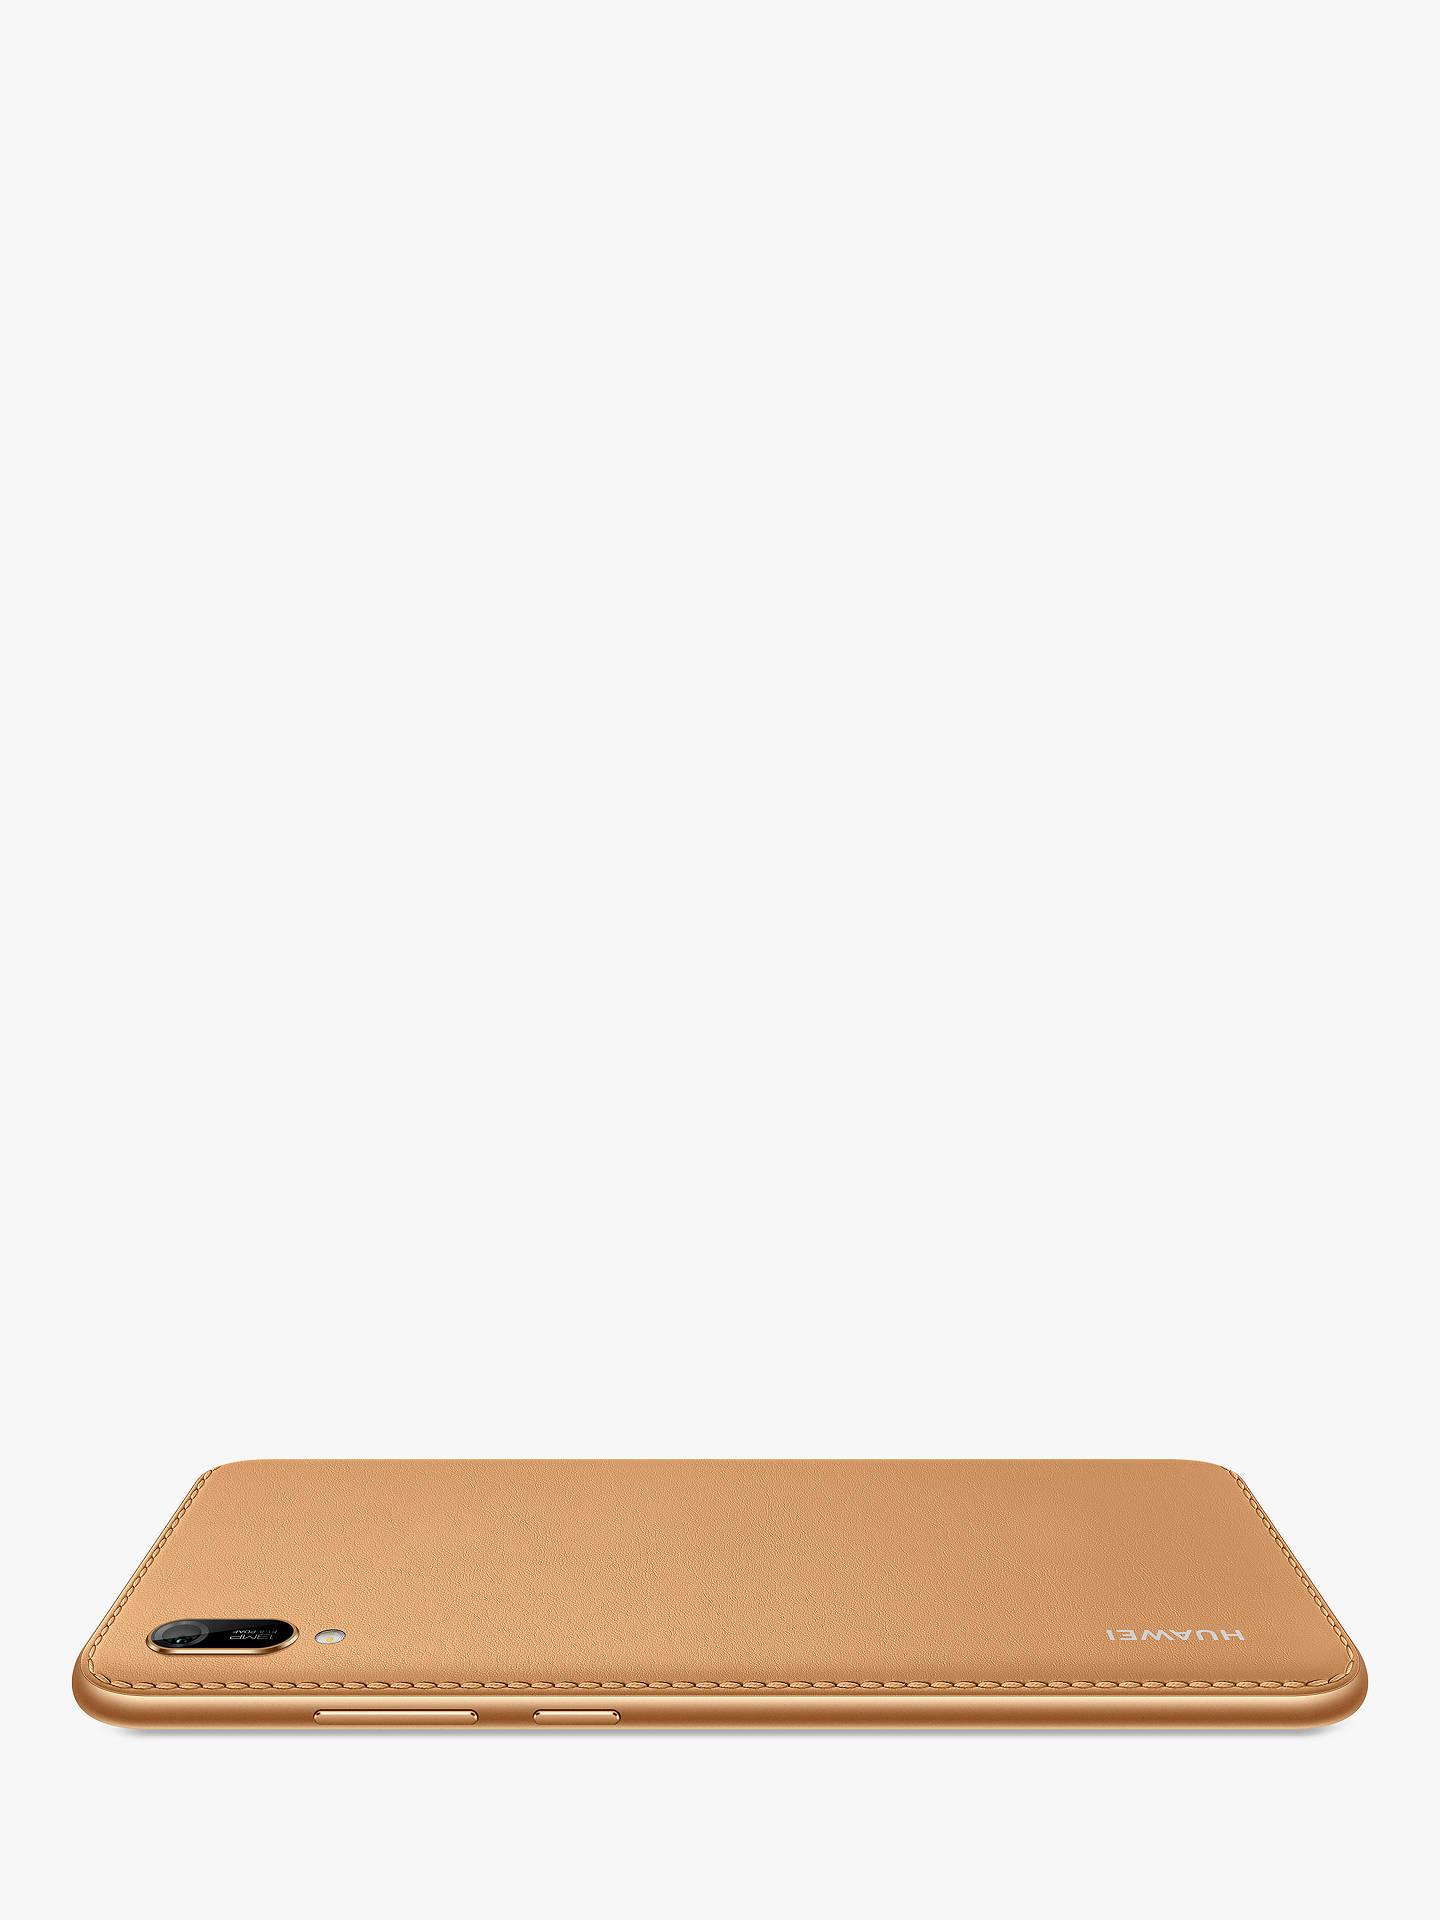 "Huawei Y6 2019 Smartphone, Android, 2GB RAM, 6 09"", 4G LTE, SIM Free, 32GB,  Amber Brown"